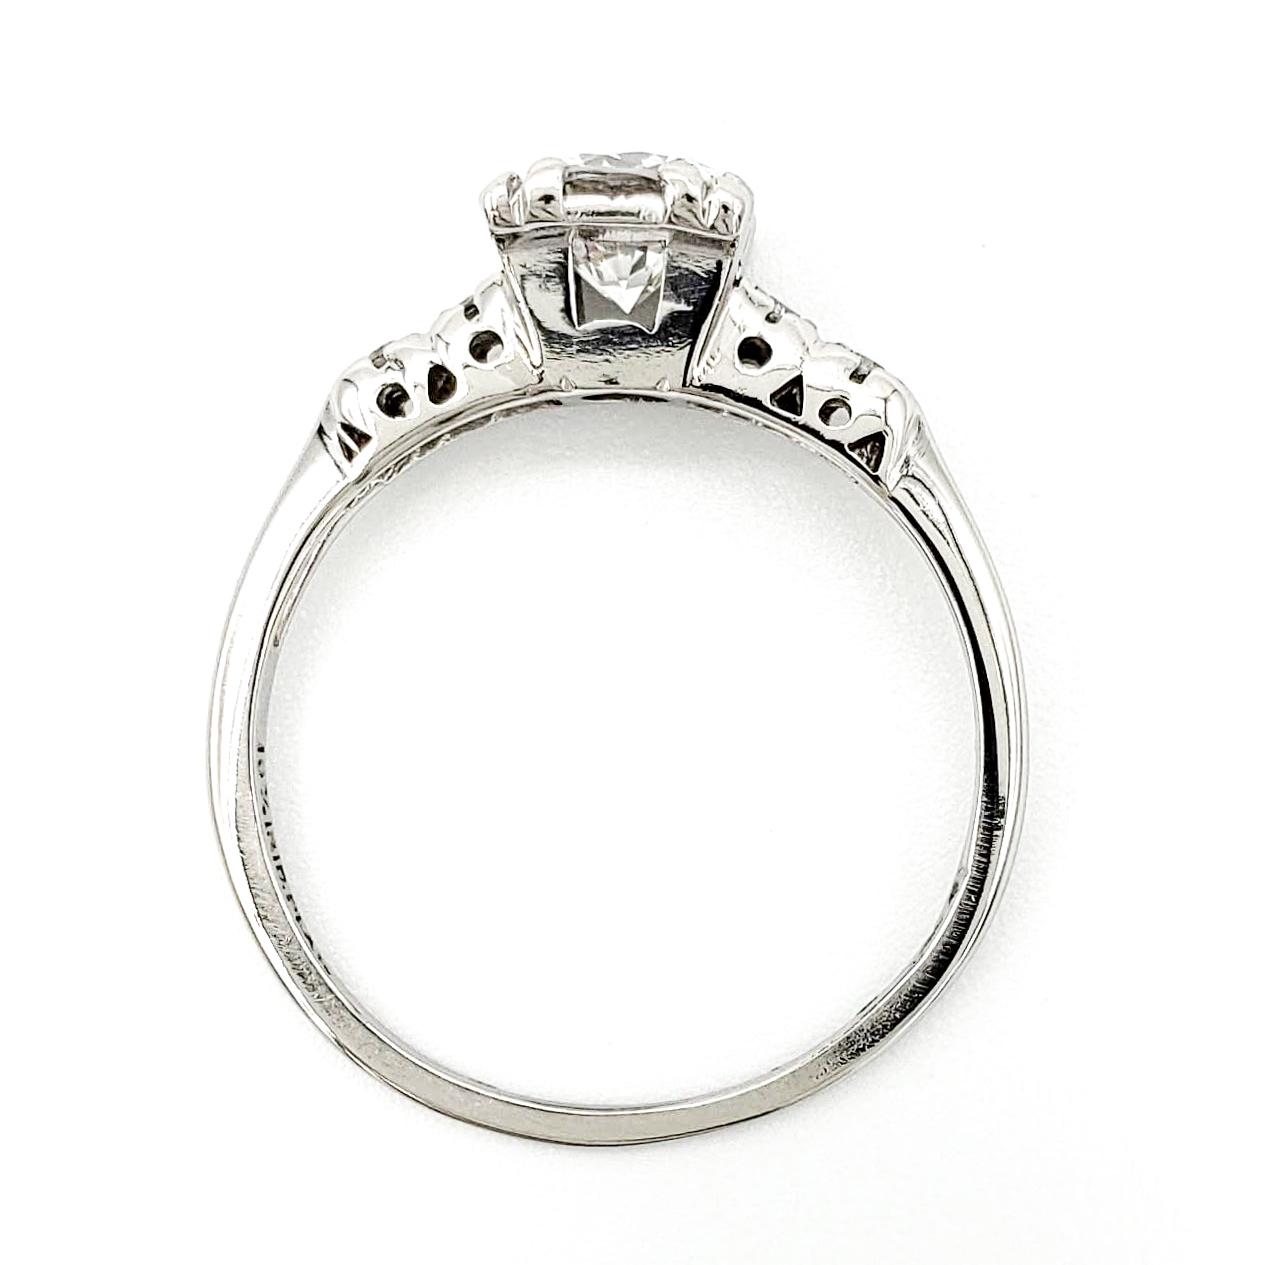 vintage-platinum-engagement-ring-with-0-63-carat-round-brilliant-cut-diamond-egl-e-si1